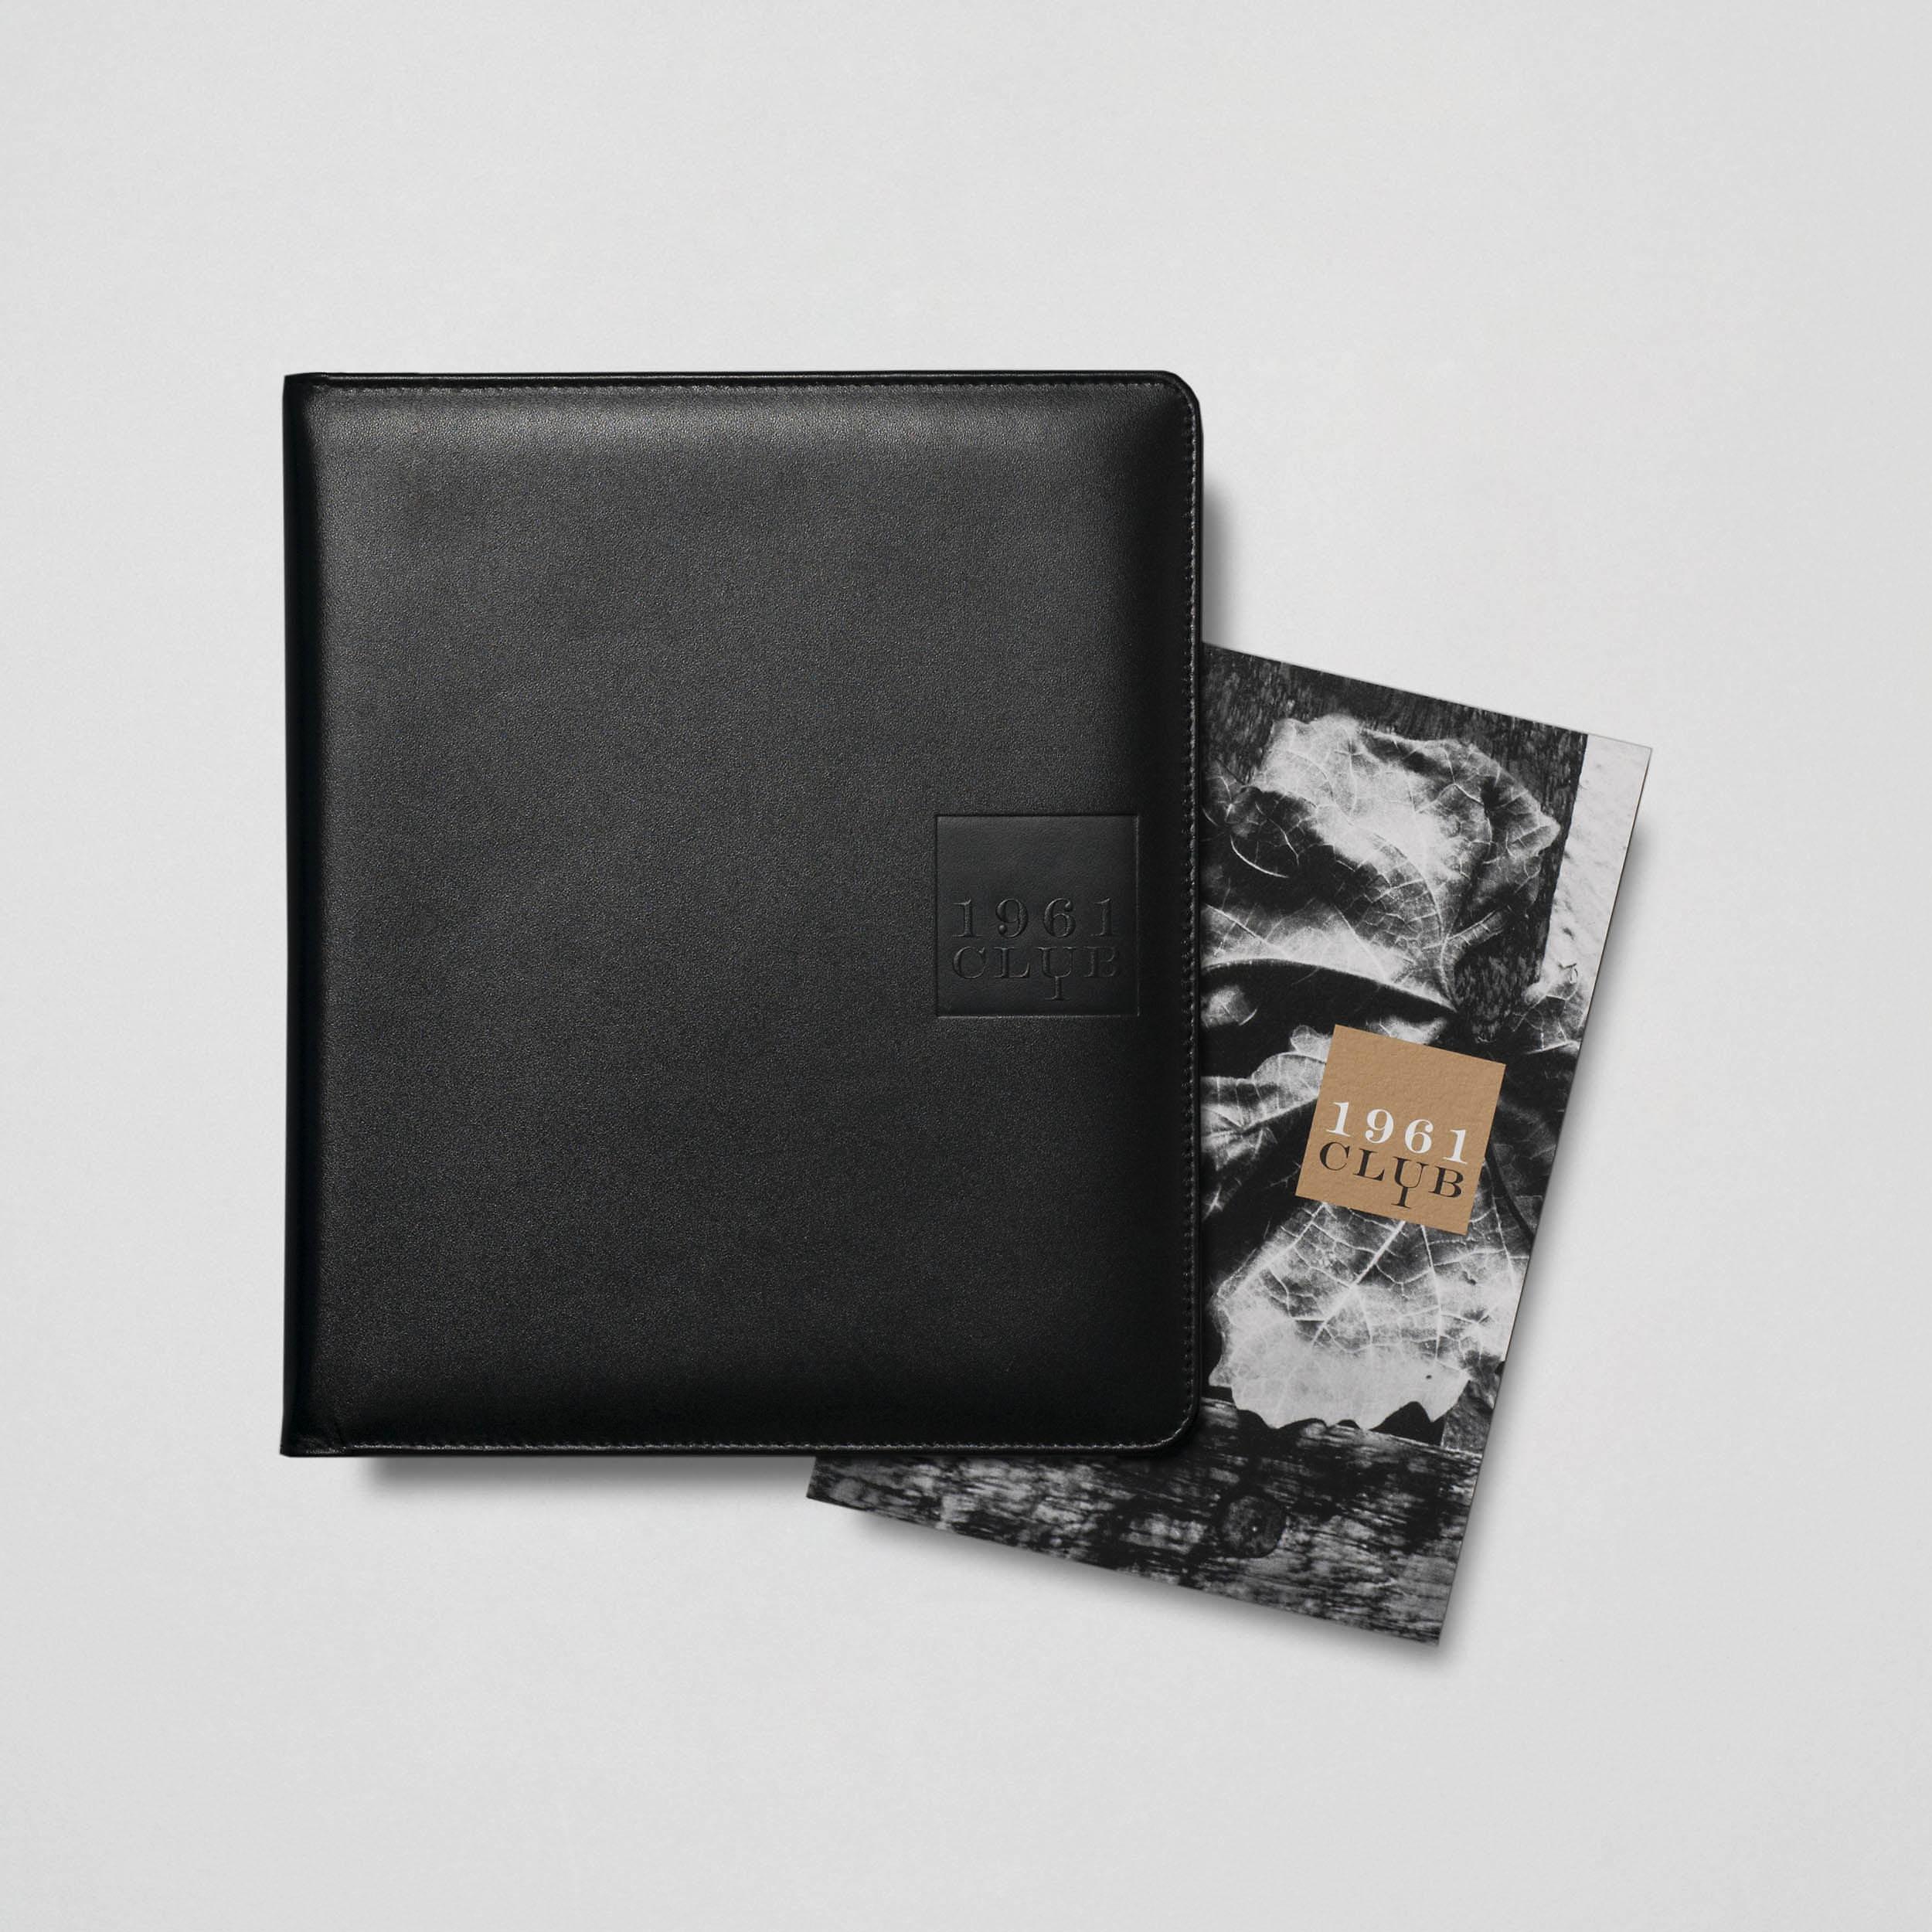 1961.Club.Wallet.Sq.jpg